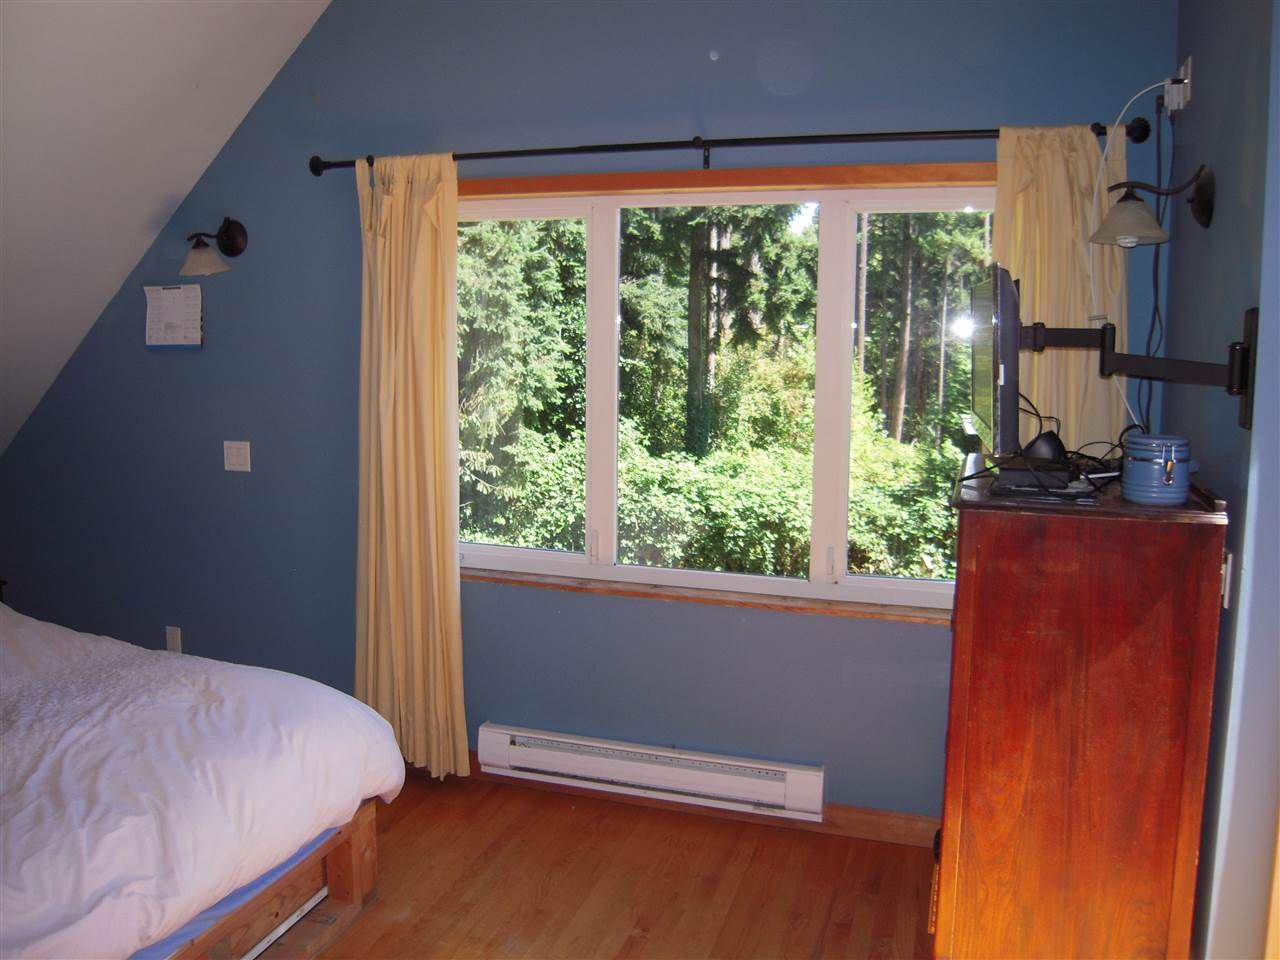 Photo 15: Photos: 2670 LOWER Road: Roberts Creek House for sale (Sunshine Coast)  : MLS®# R2096275